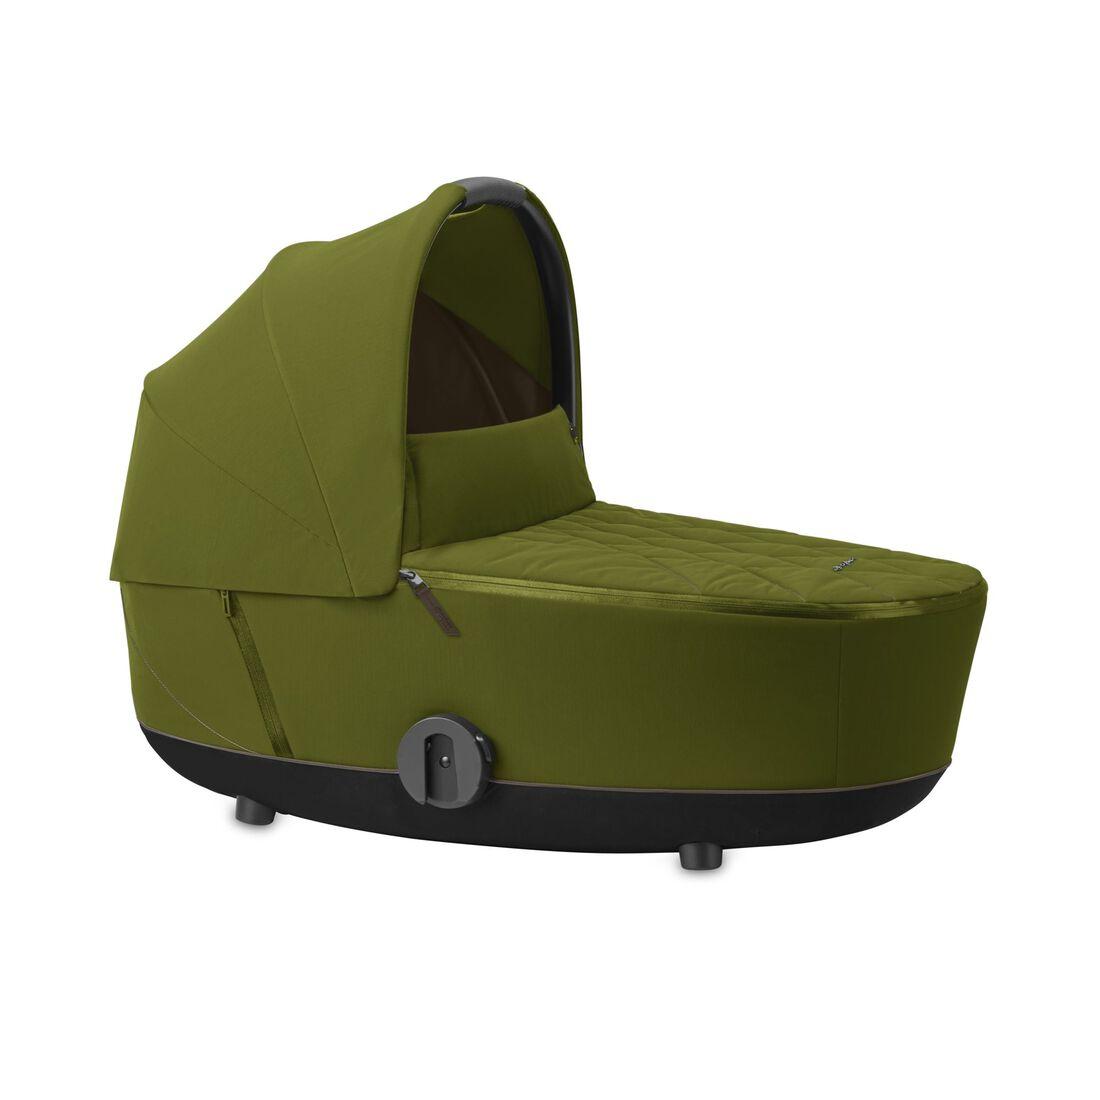 CYBEX Mios Lux Carry Cot - Khaki Green in Khaki Green large Bild 1